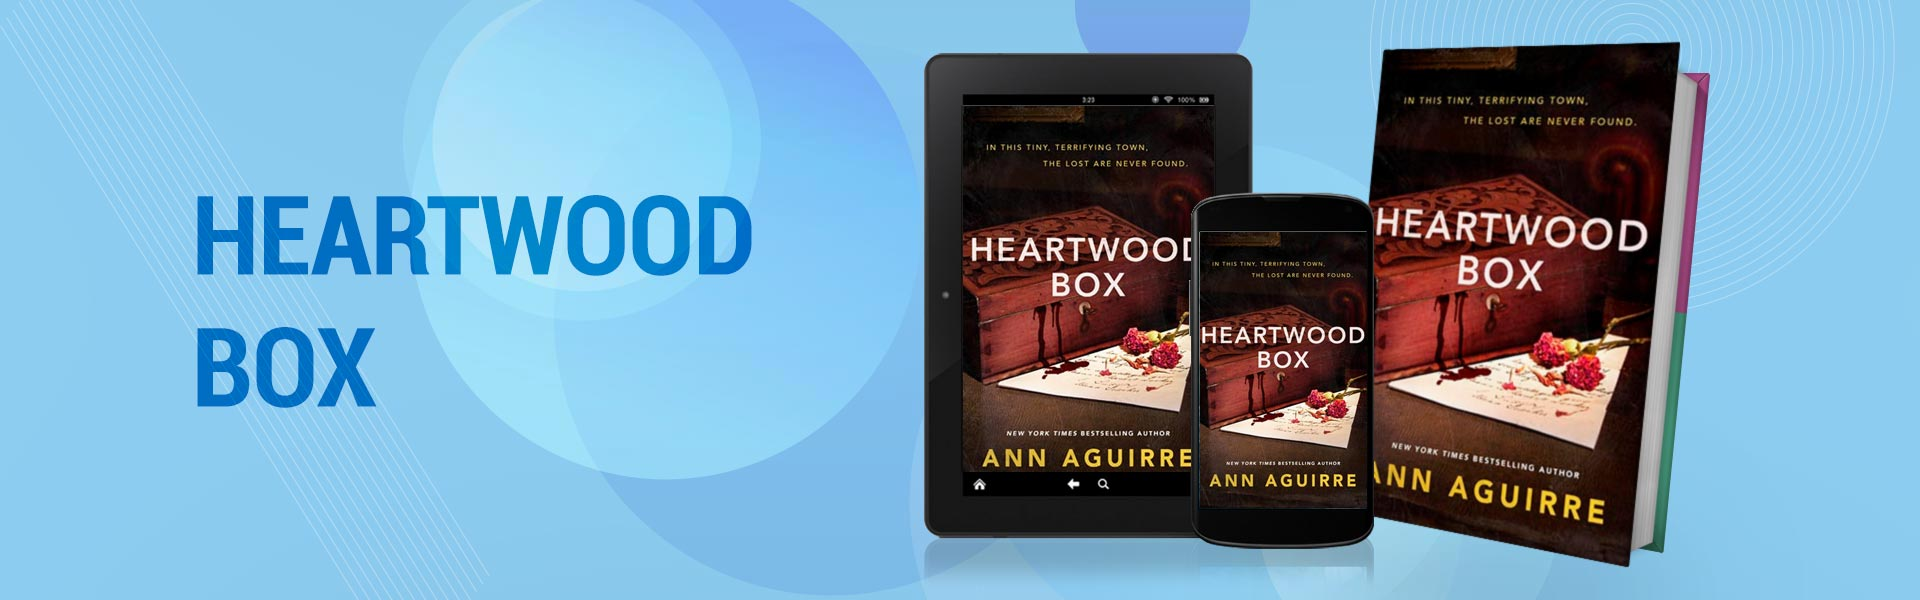 HEARTWOOD-BOX